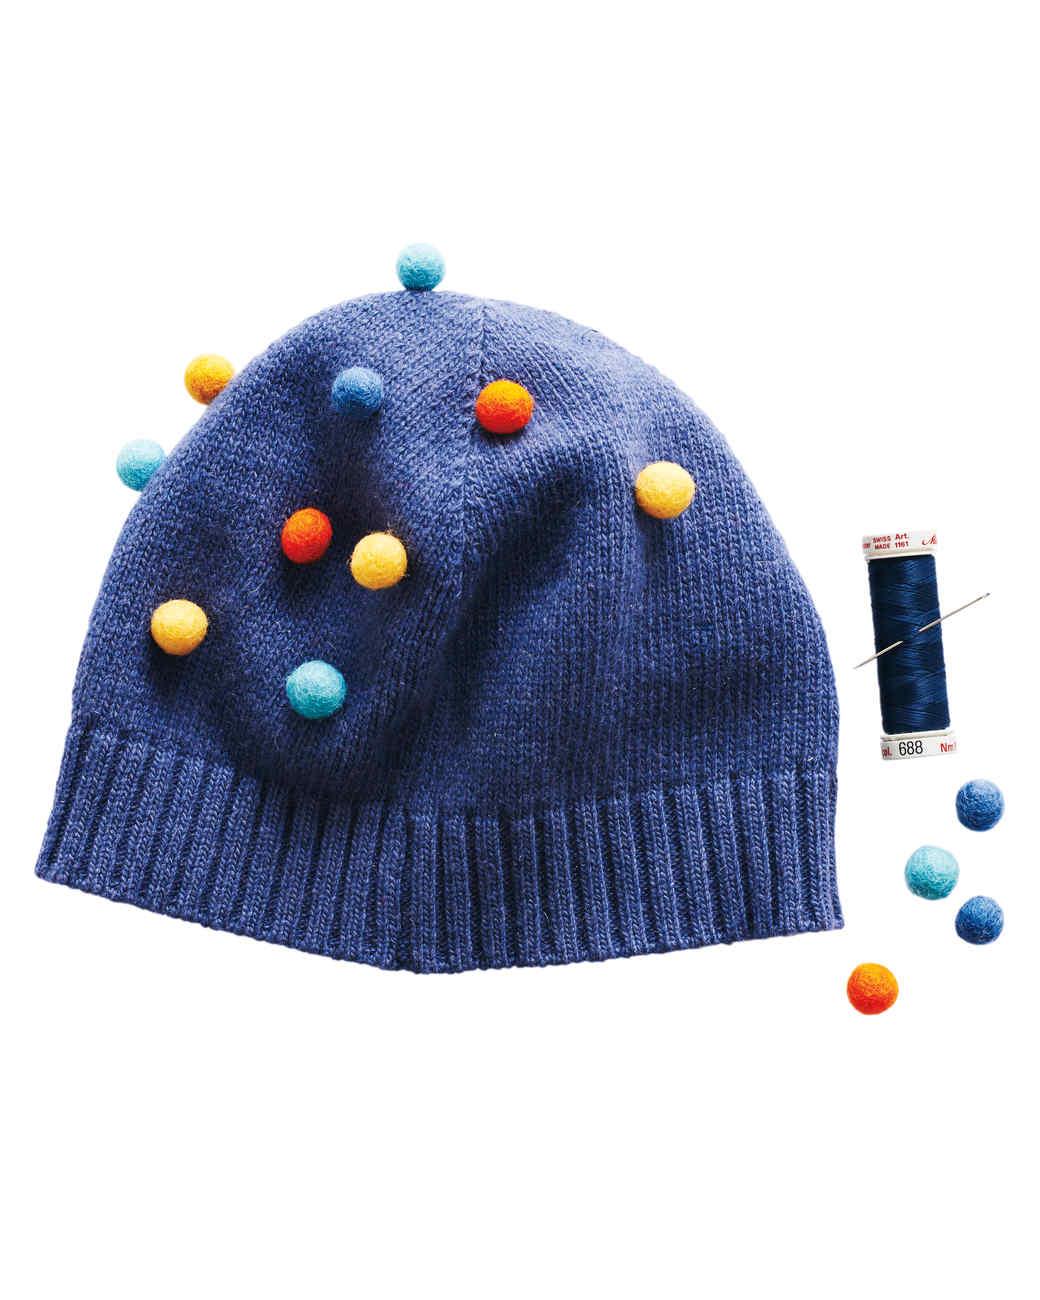 hat-silo-302-d111452.jpg